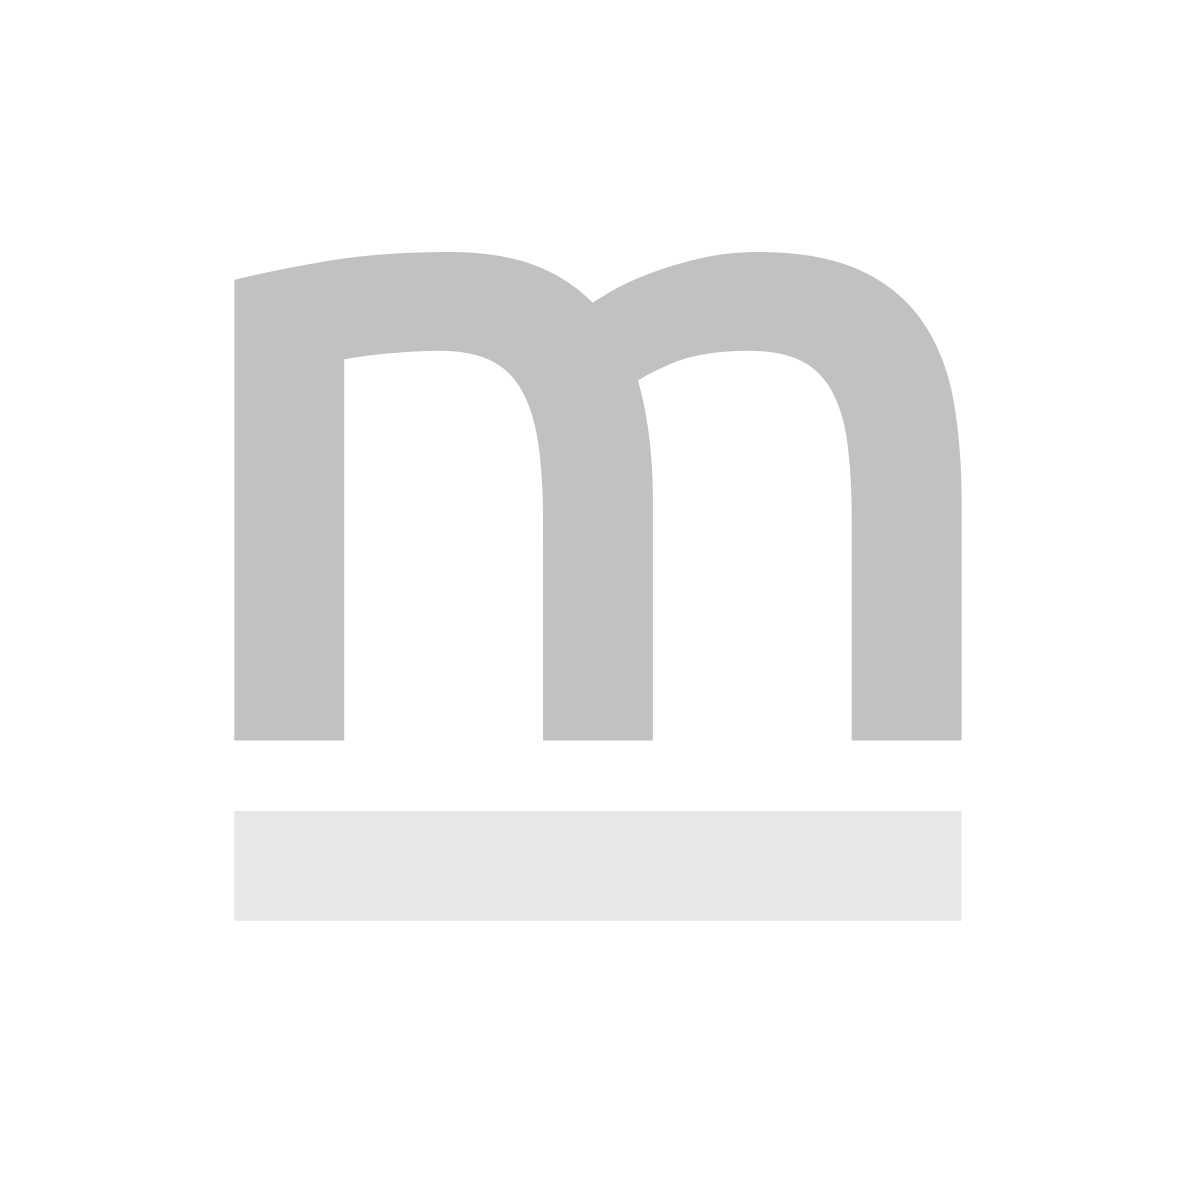 Krzesło CLAUDINE 1 VELVET brązowe